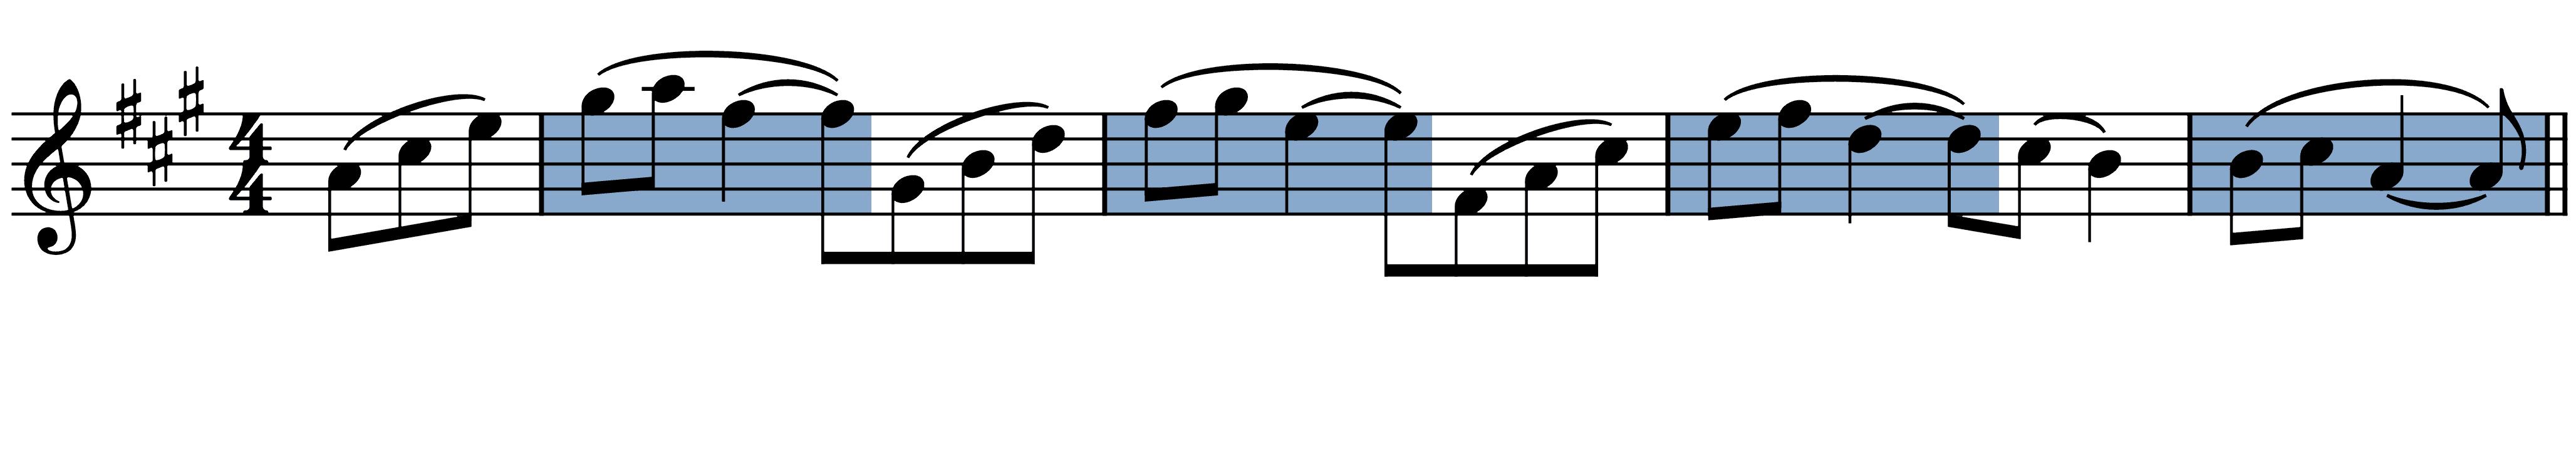 rachmaninov-adagio-theme melodic figures